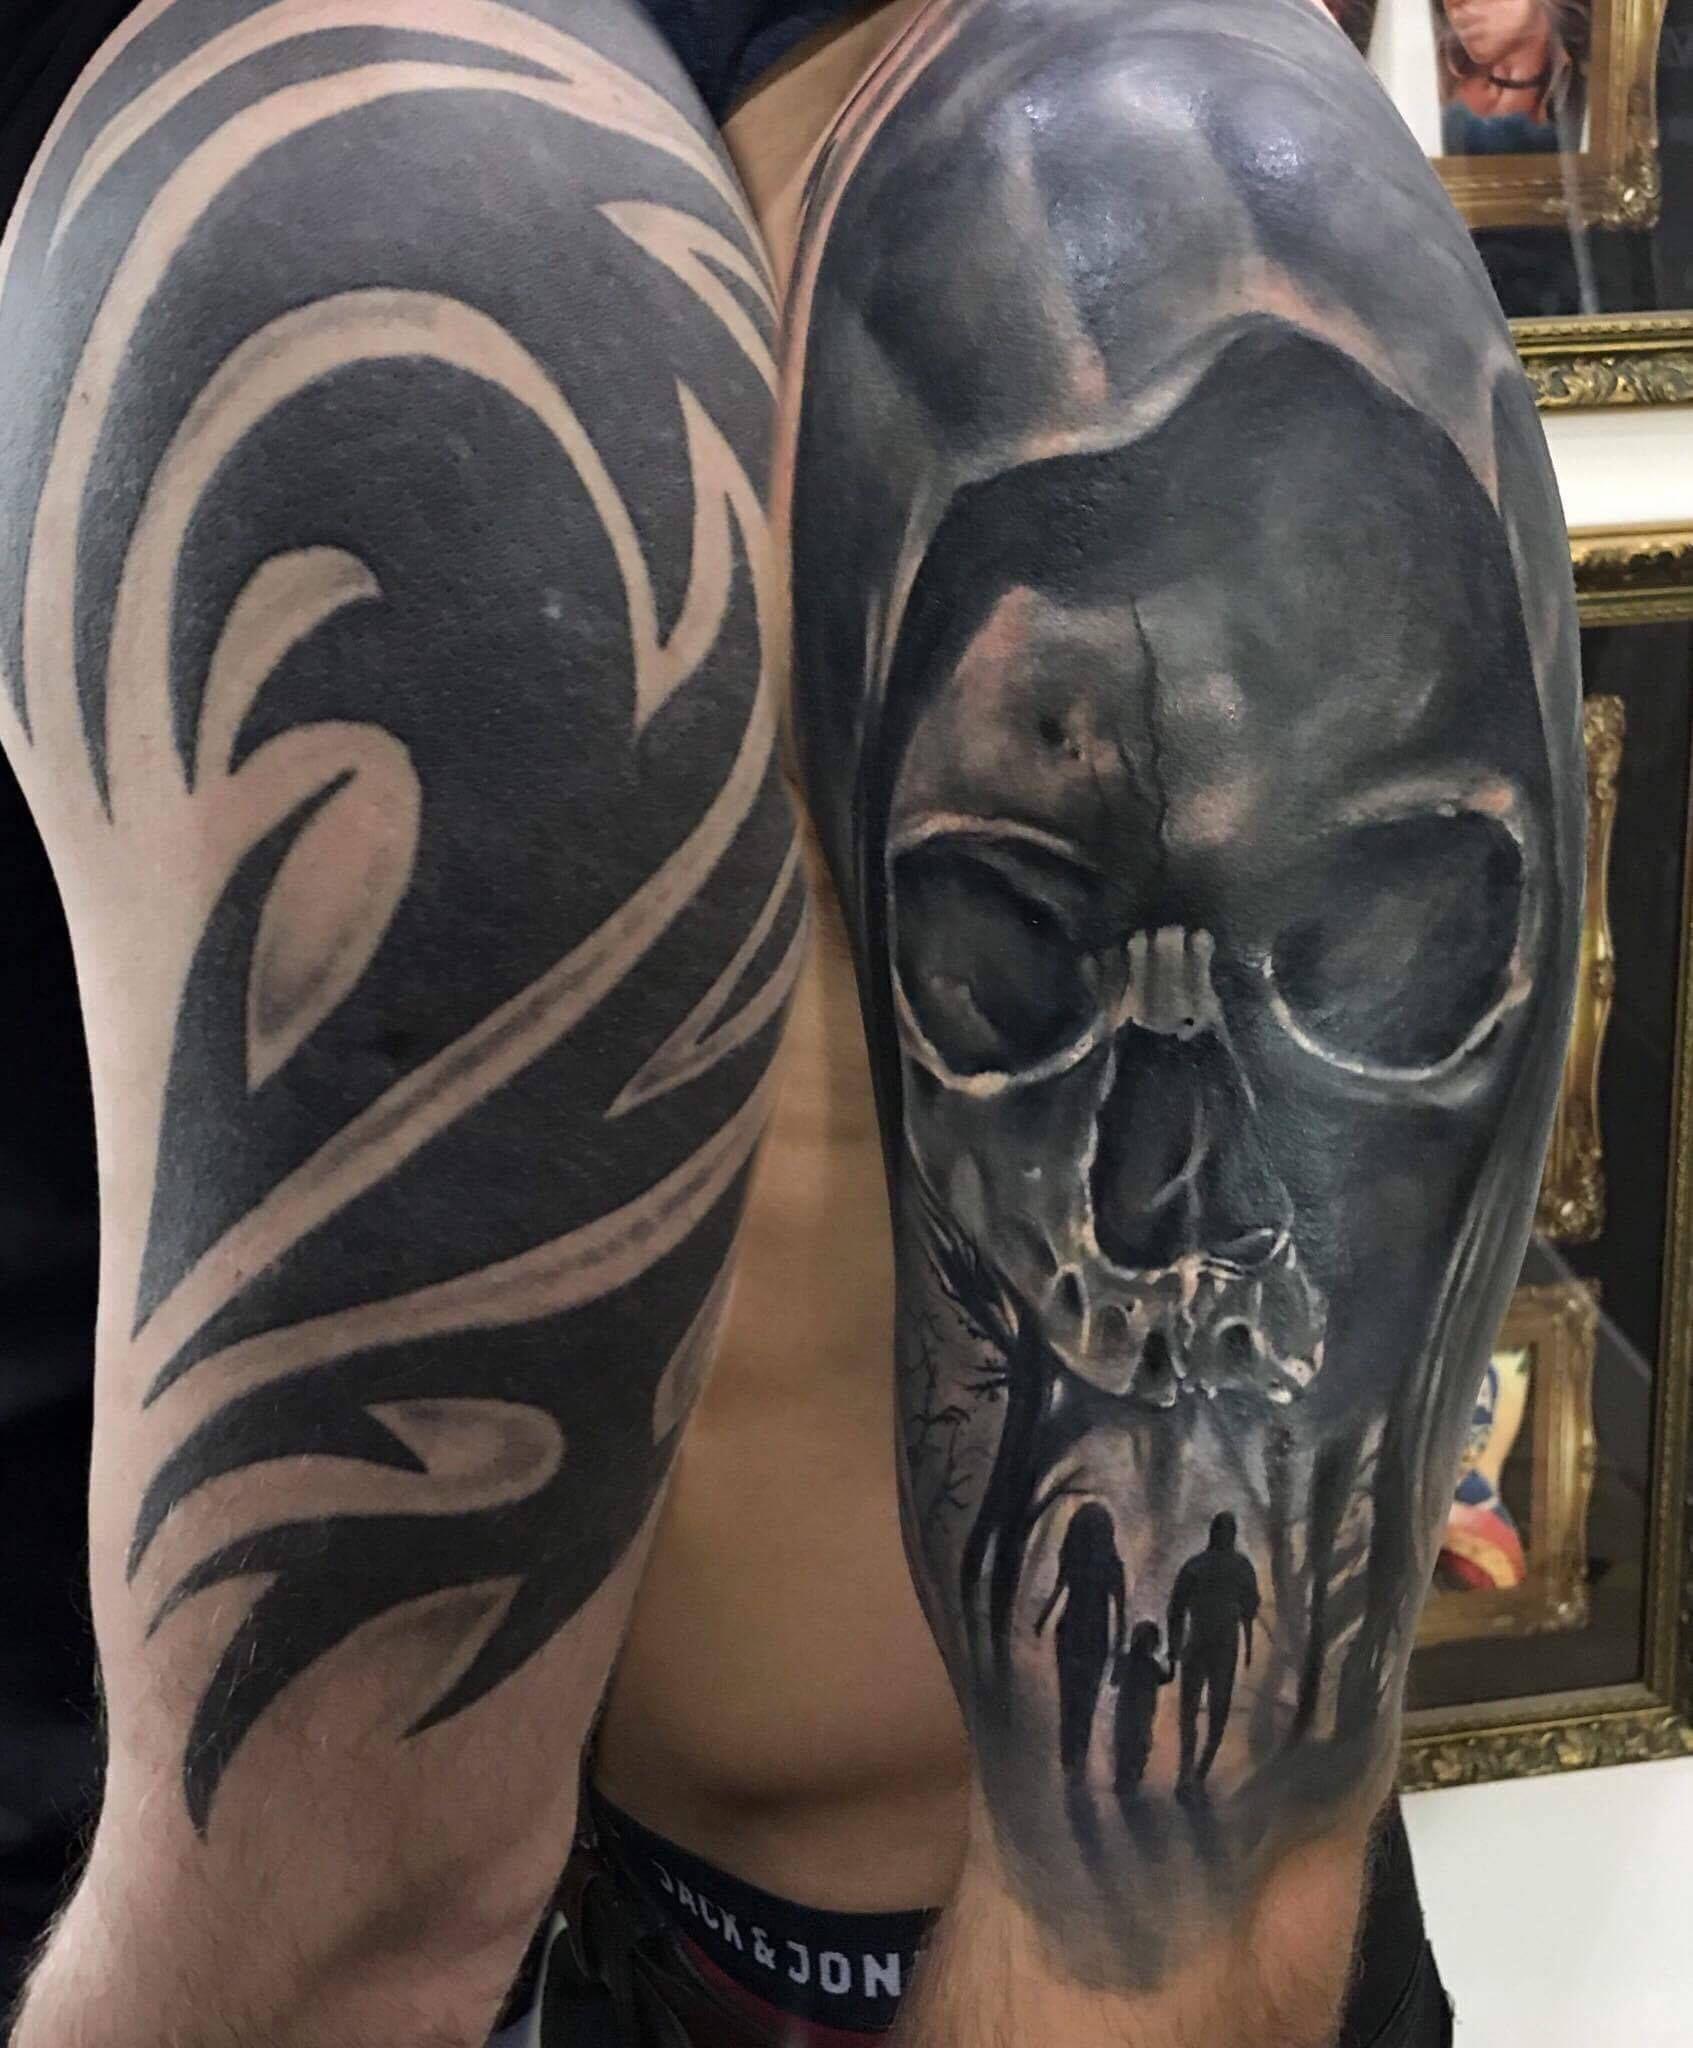 Skull Tribal Coverup Tattoo By Sebastian Limited Availability At Salvation Tattoo Studios Cobertura De Tatuagem Tatuagem Preta Tatuagem